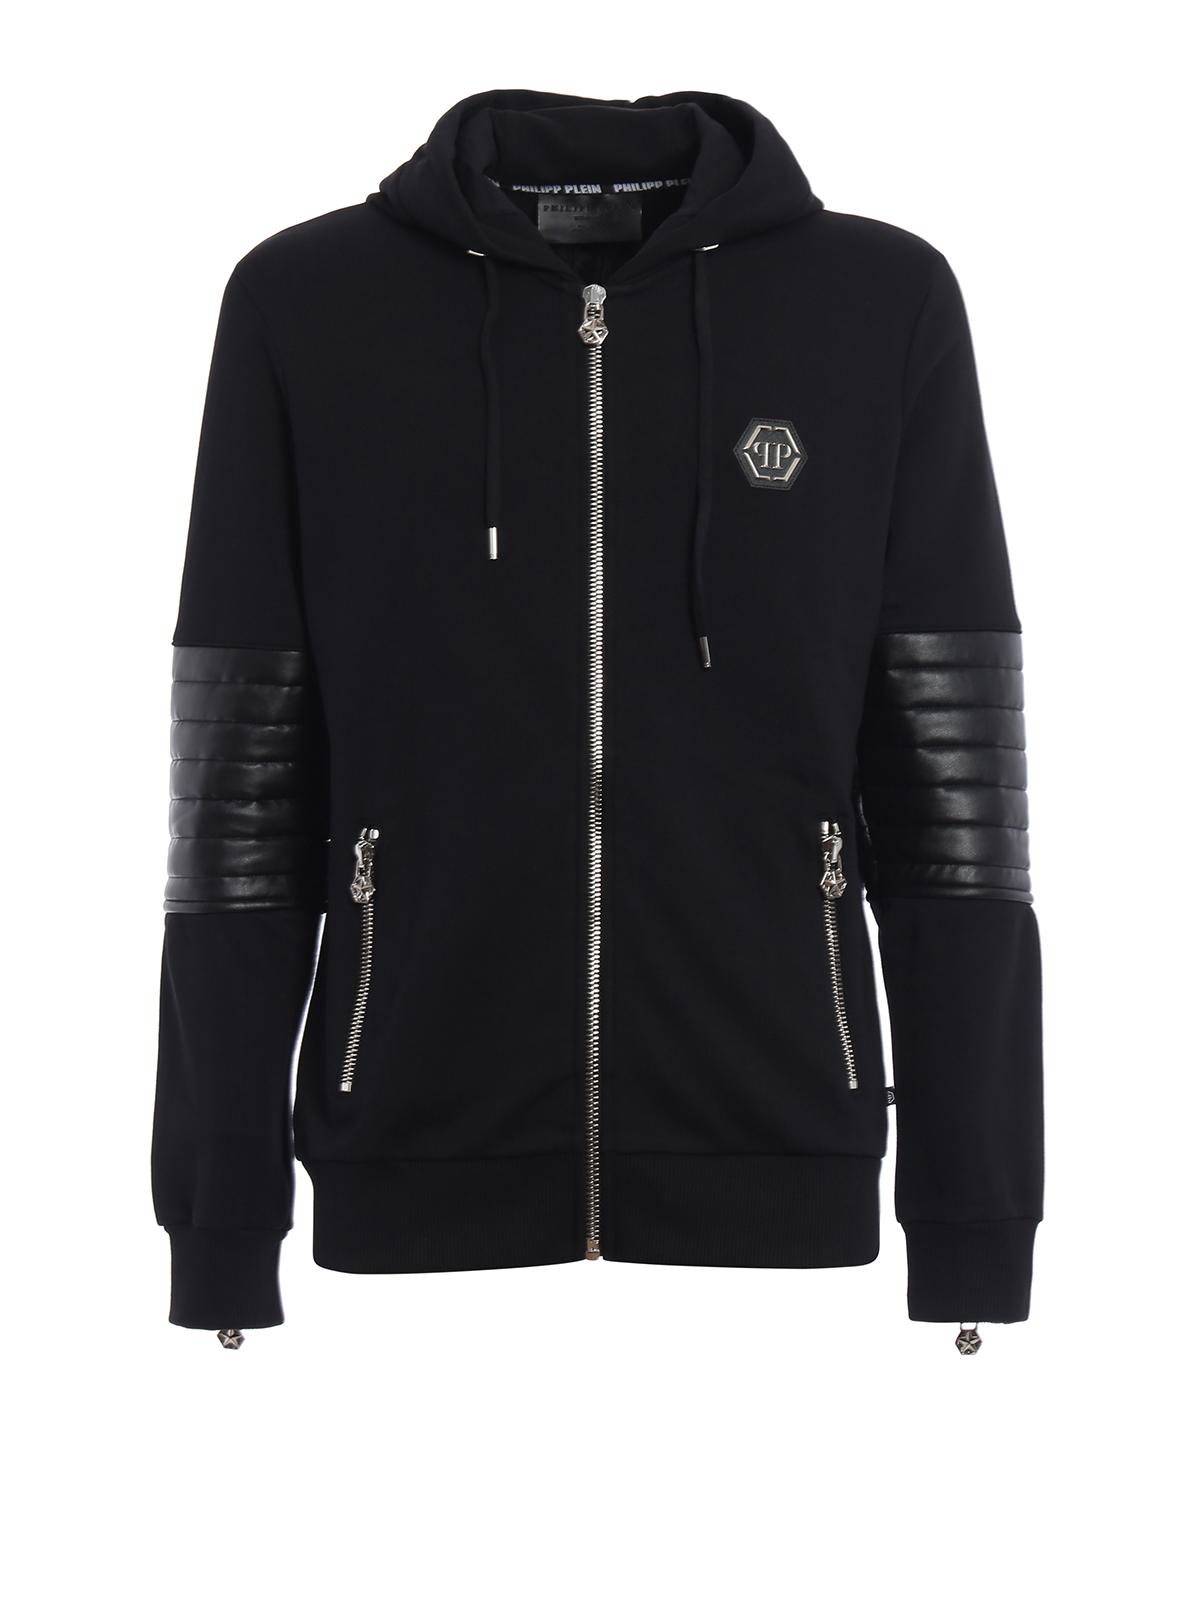 nyorai hooded sweat jacket by philipp plein sweatshirts sweaters shop online at. Black Bedroom Furniture Sets. Home Design Ideas